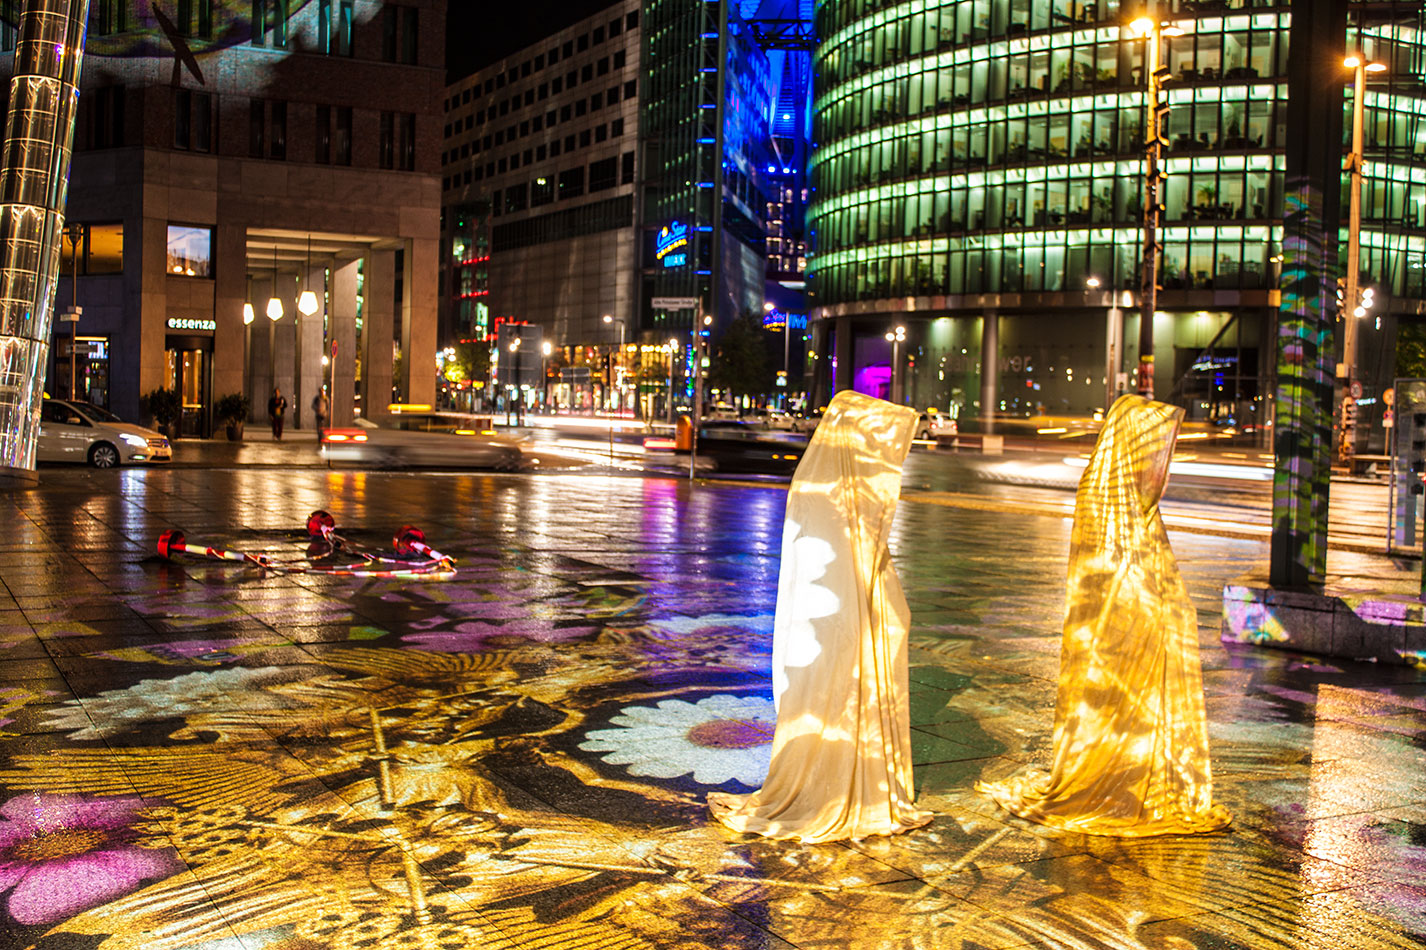 festival-of-lights-berlin-light-art-festival-contemporary-fine-art-design-show-large-scale-sculpture-guardiansof-time-manfred-kili-kielnhofer-sculpture-3879